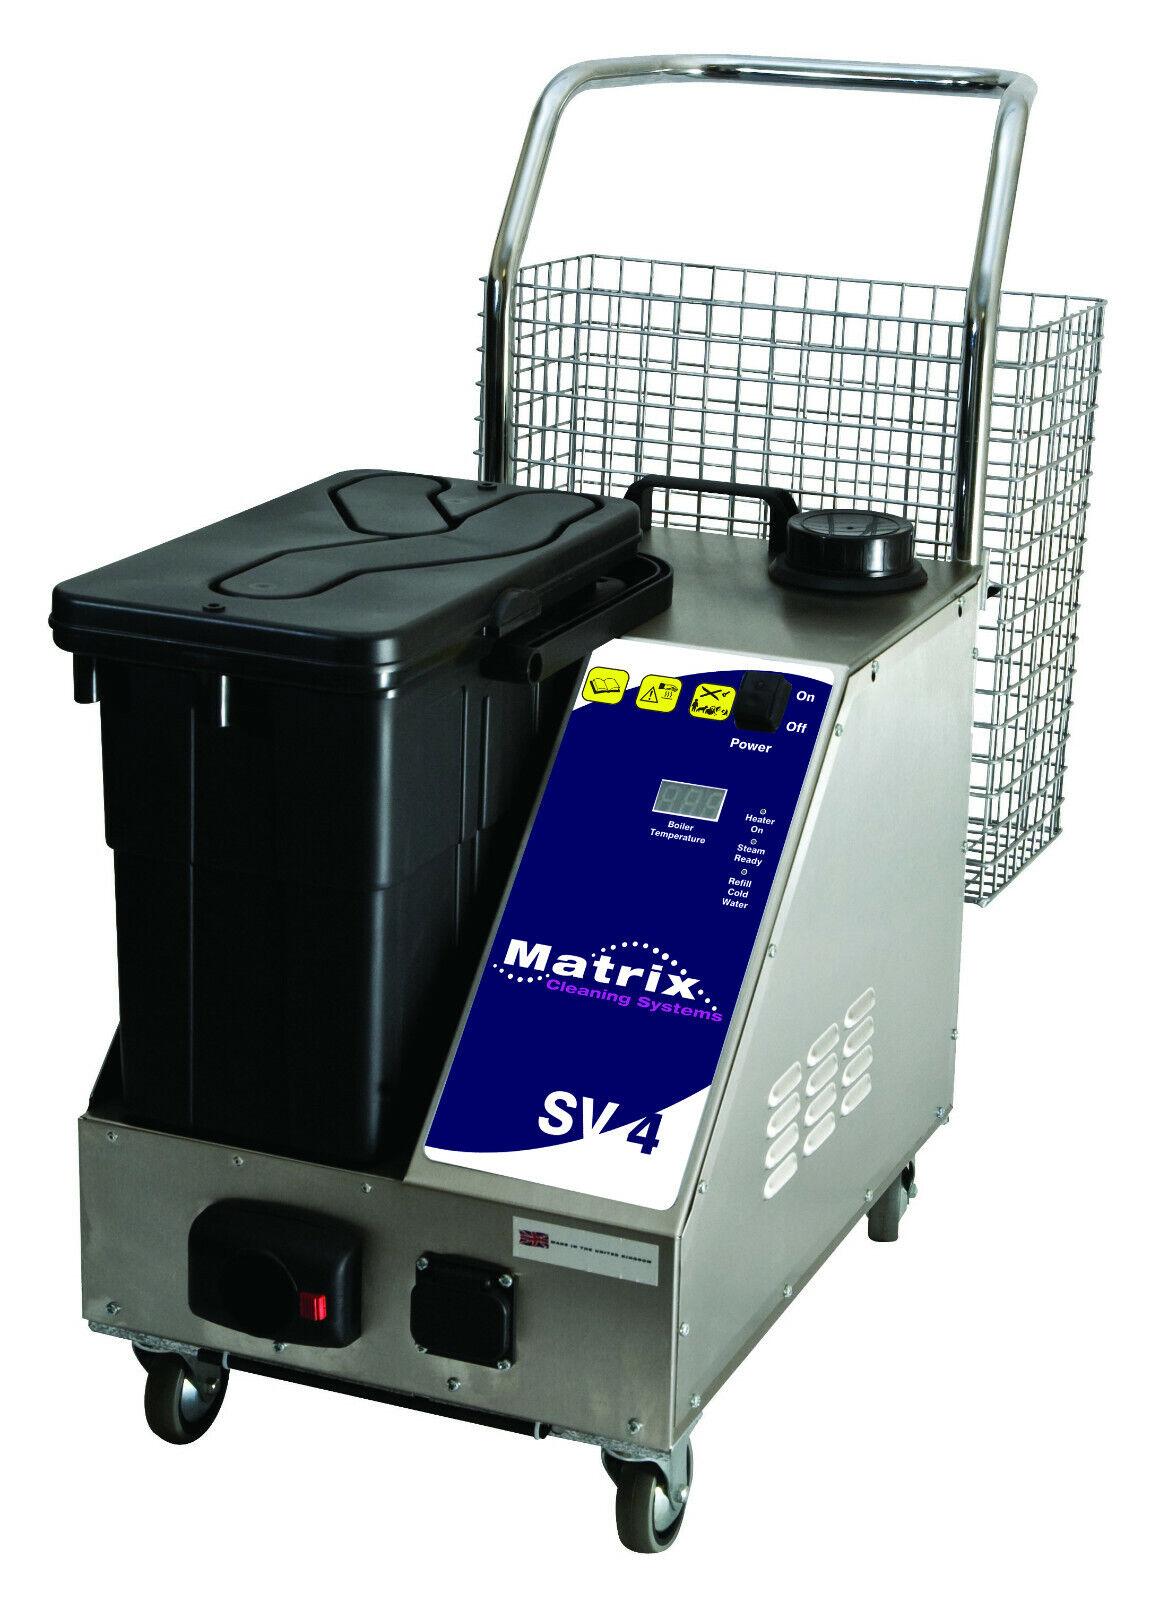 MATRIX SV4 Steam Cleaner & Vacuum Brand New with full tool kit